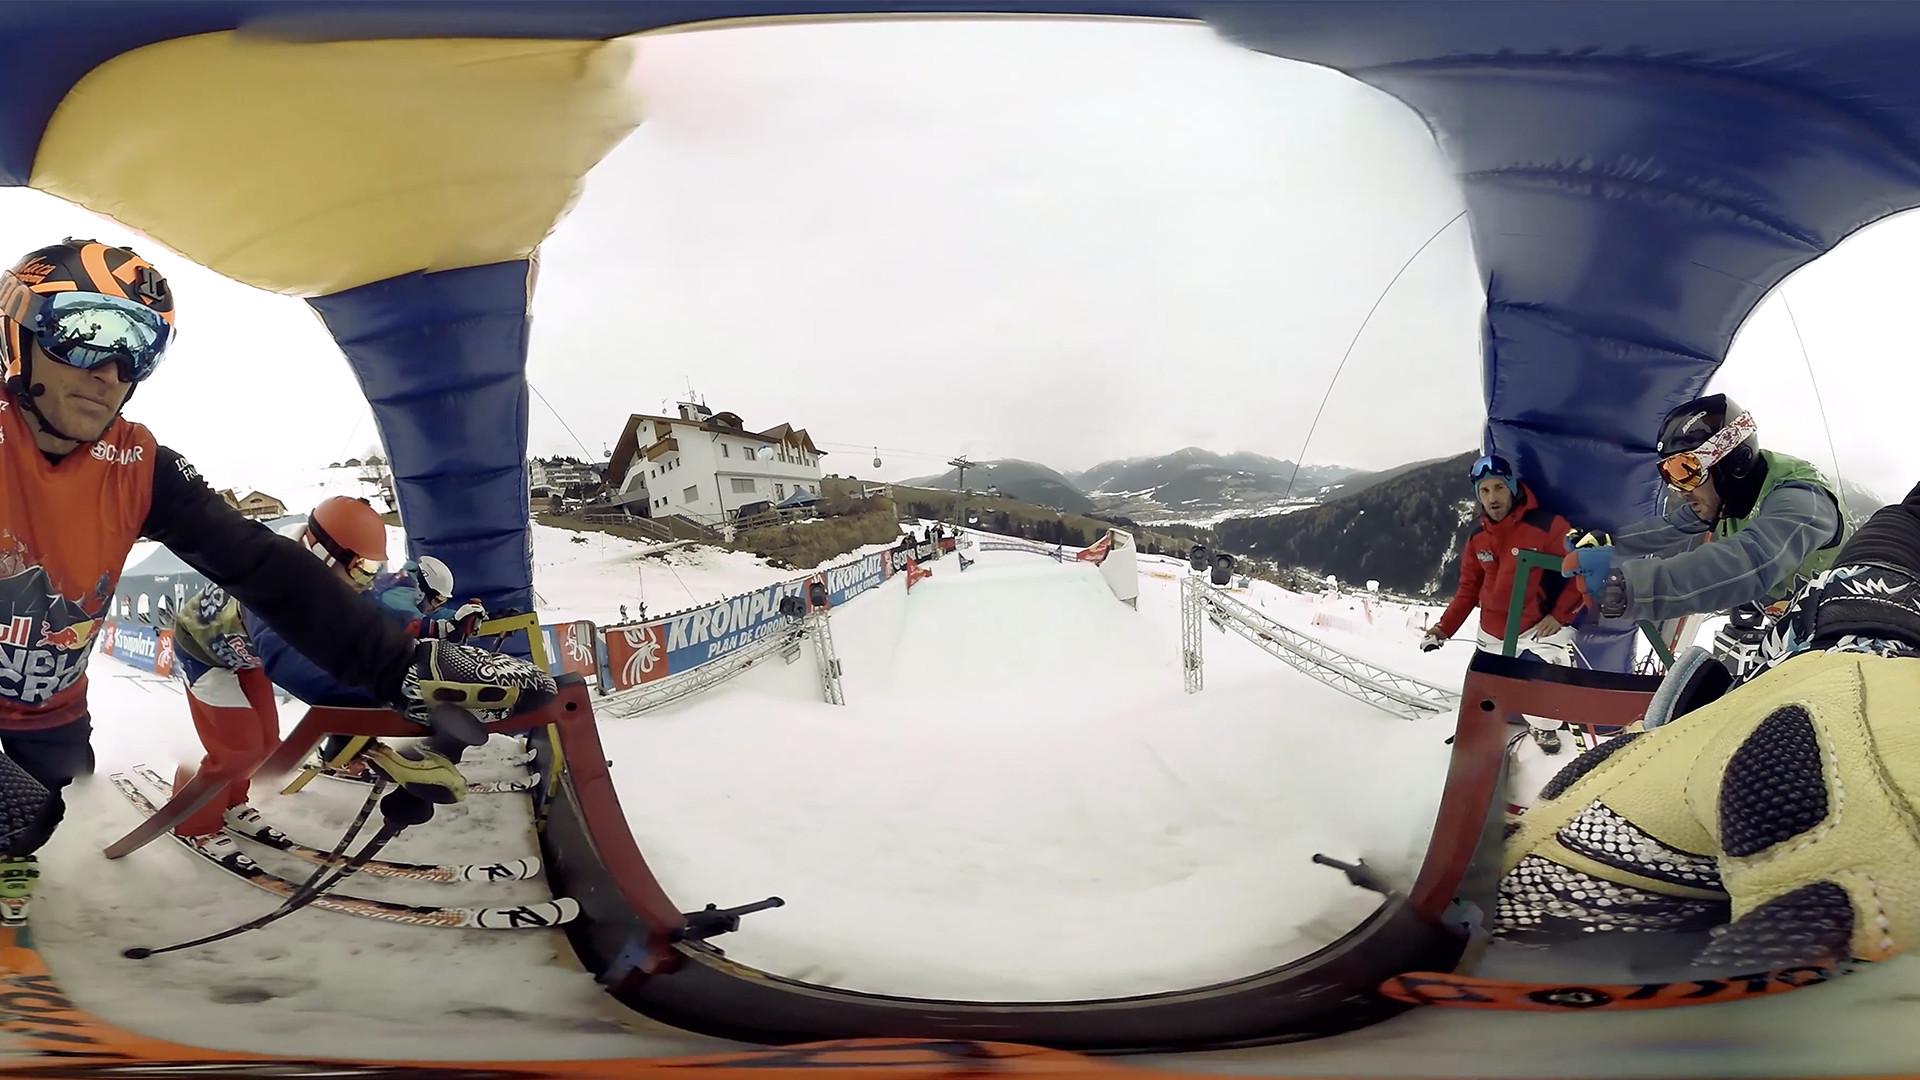 Redbull Video VR